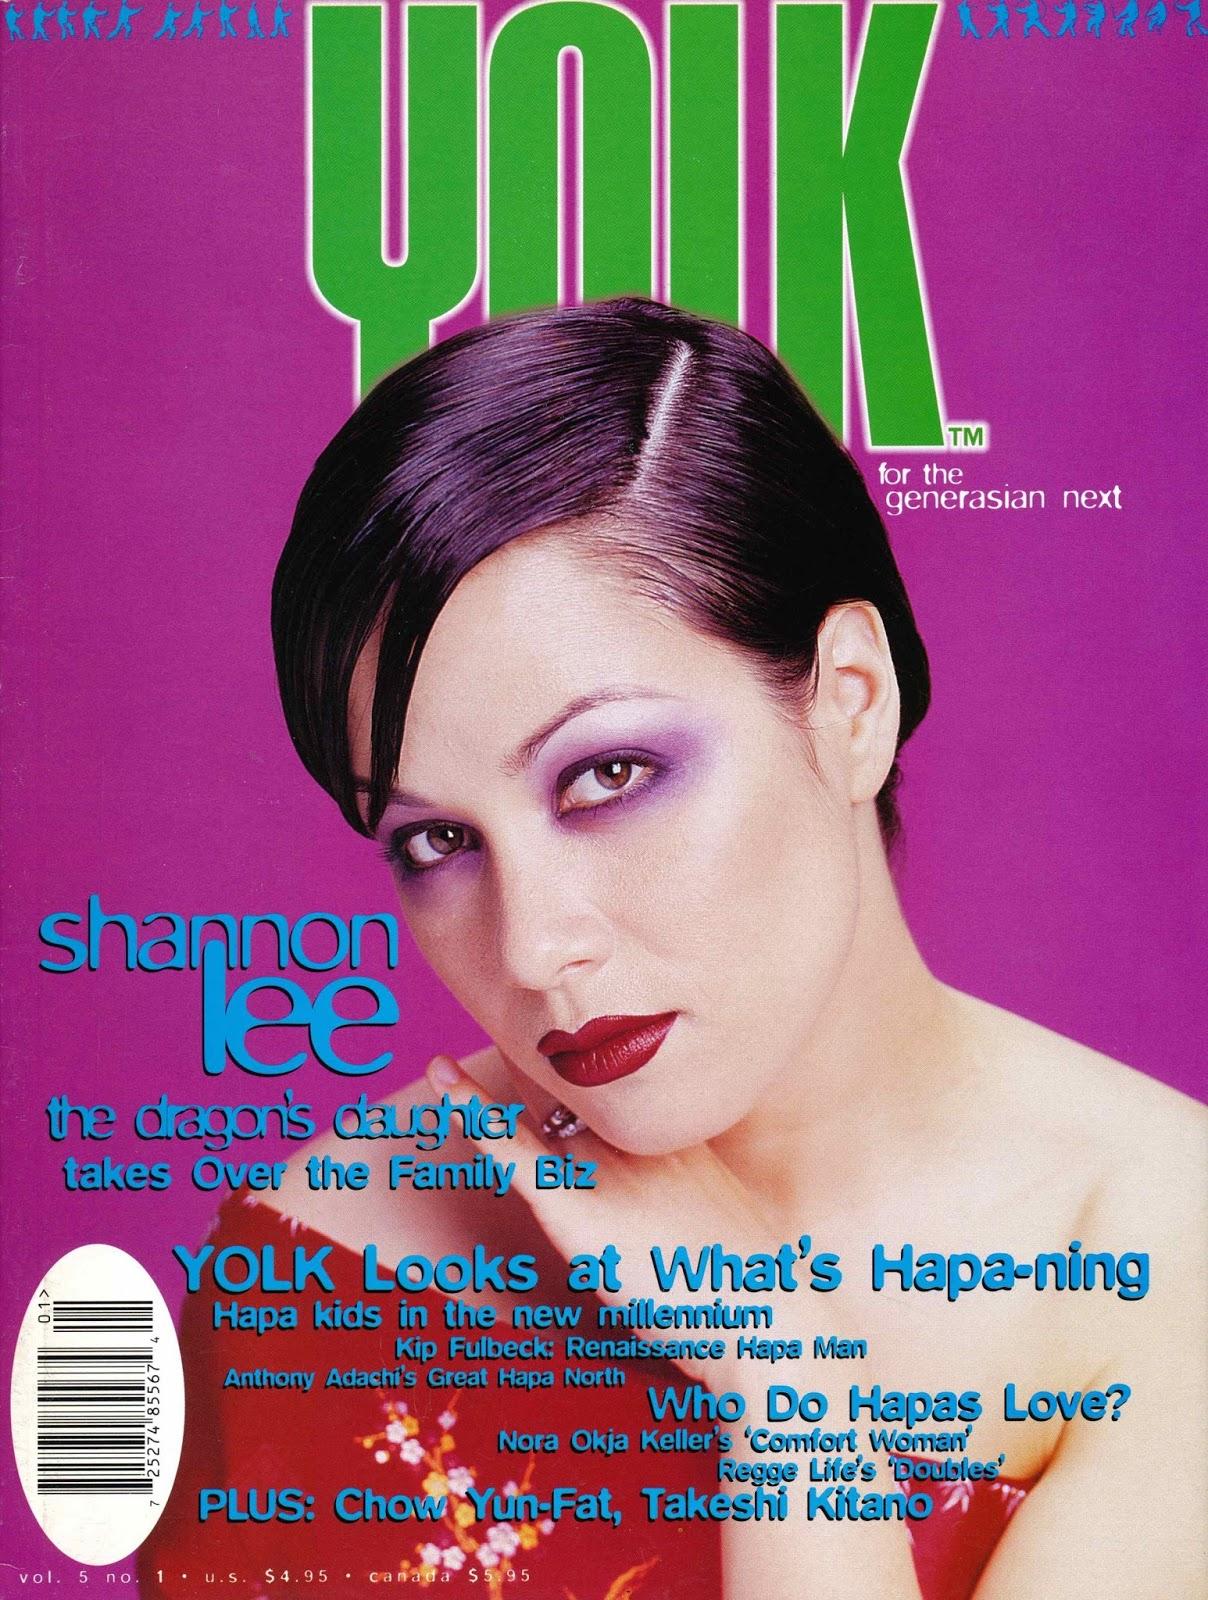 Carol Banawa (b. 1981),Brooke Bloom Porn clips Lisa Thornhill,Constance Towers